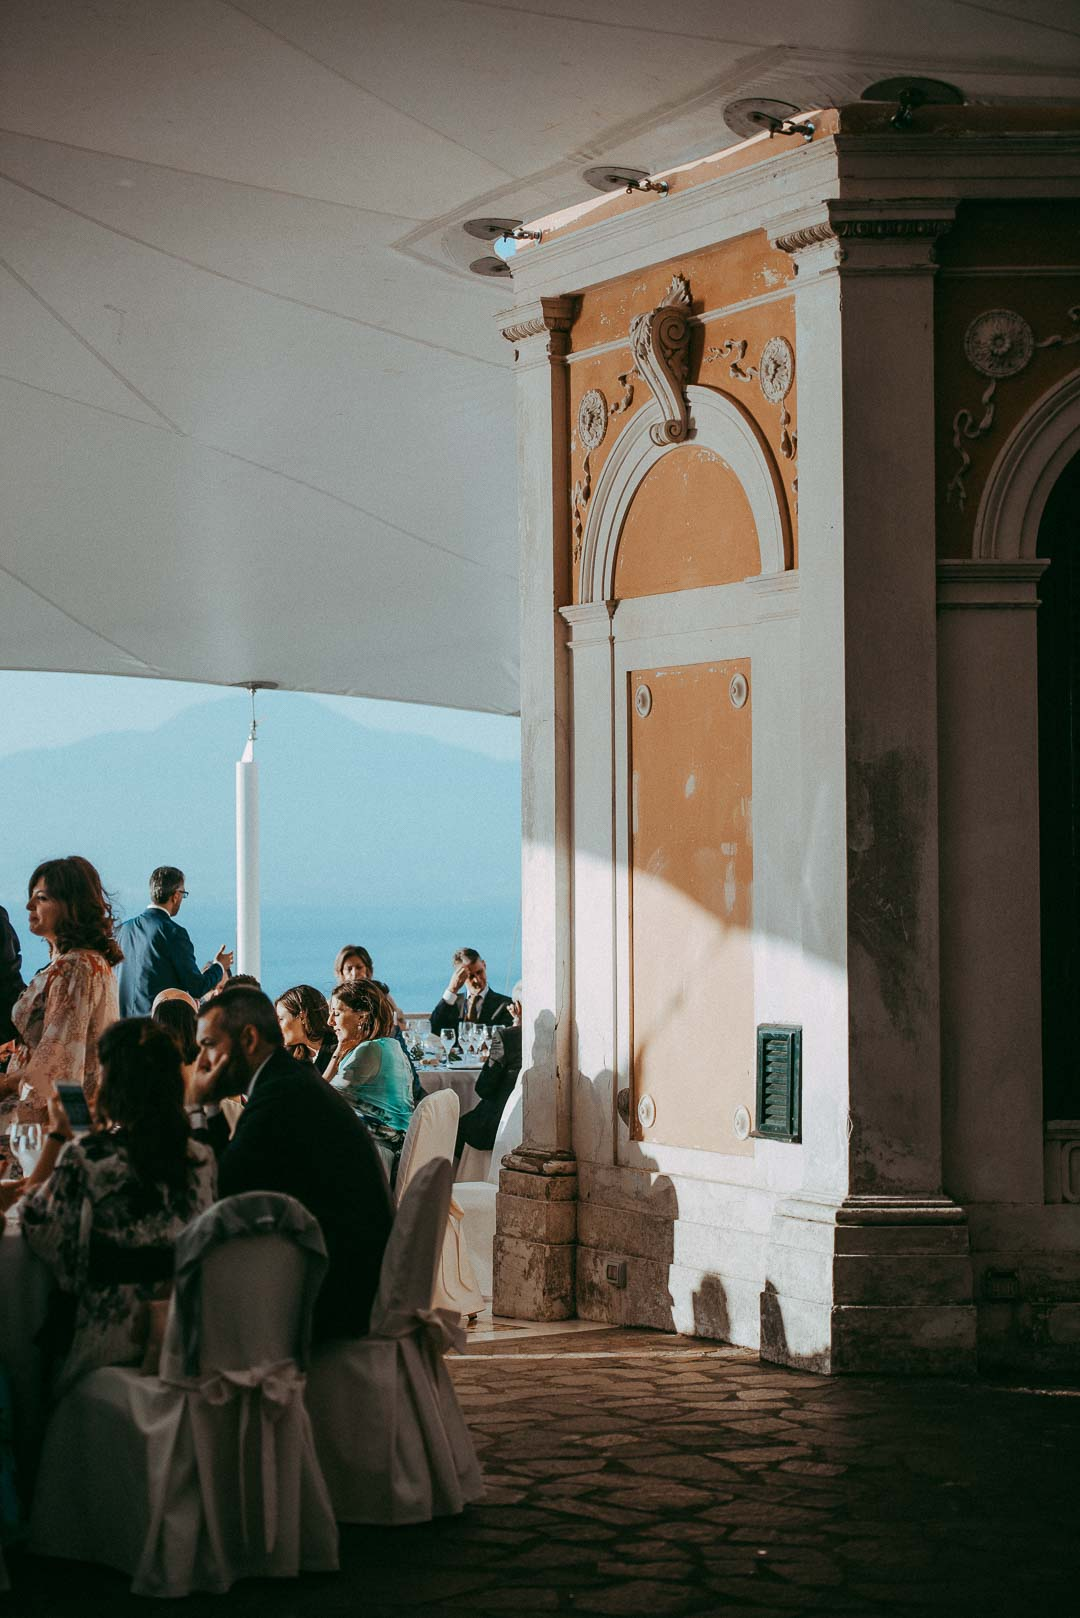 wedding-photographer-destination-fineart-bespoke-reportage-sorrento-parcodeiprincipi-vivianeizzo-spazio46-91